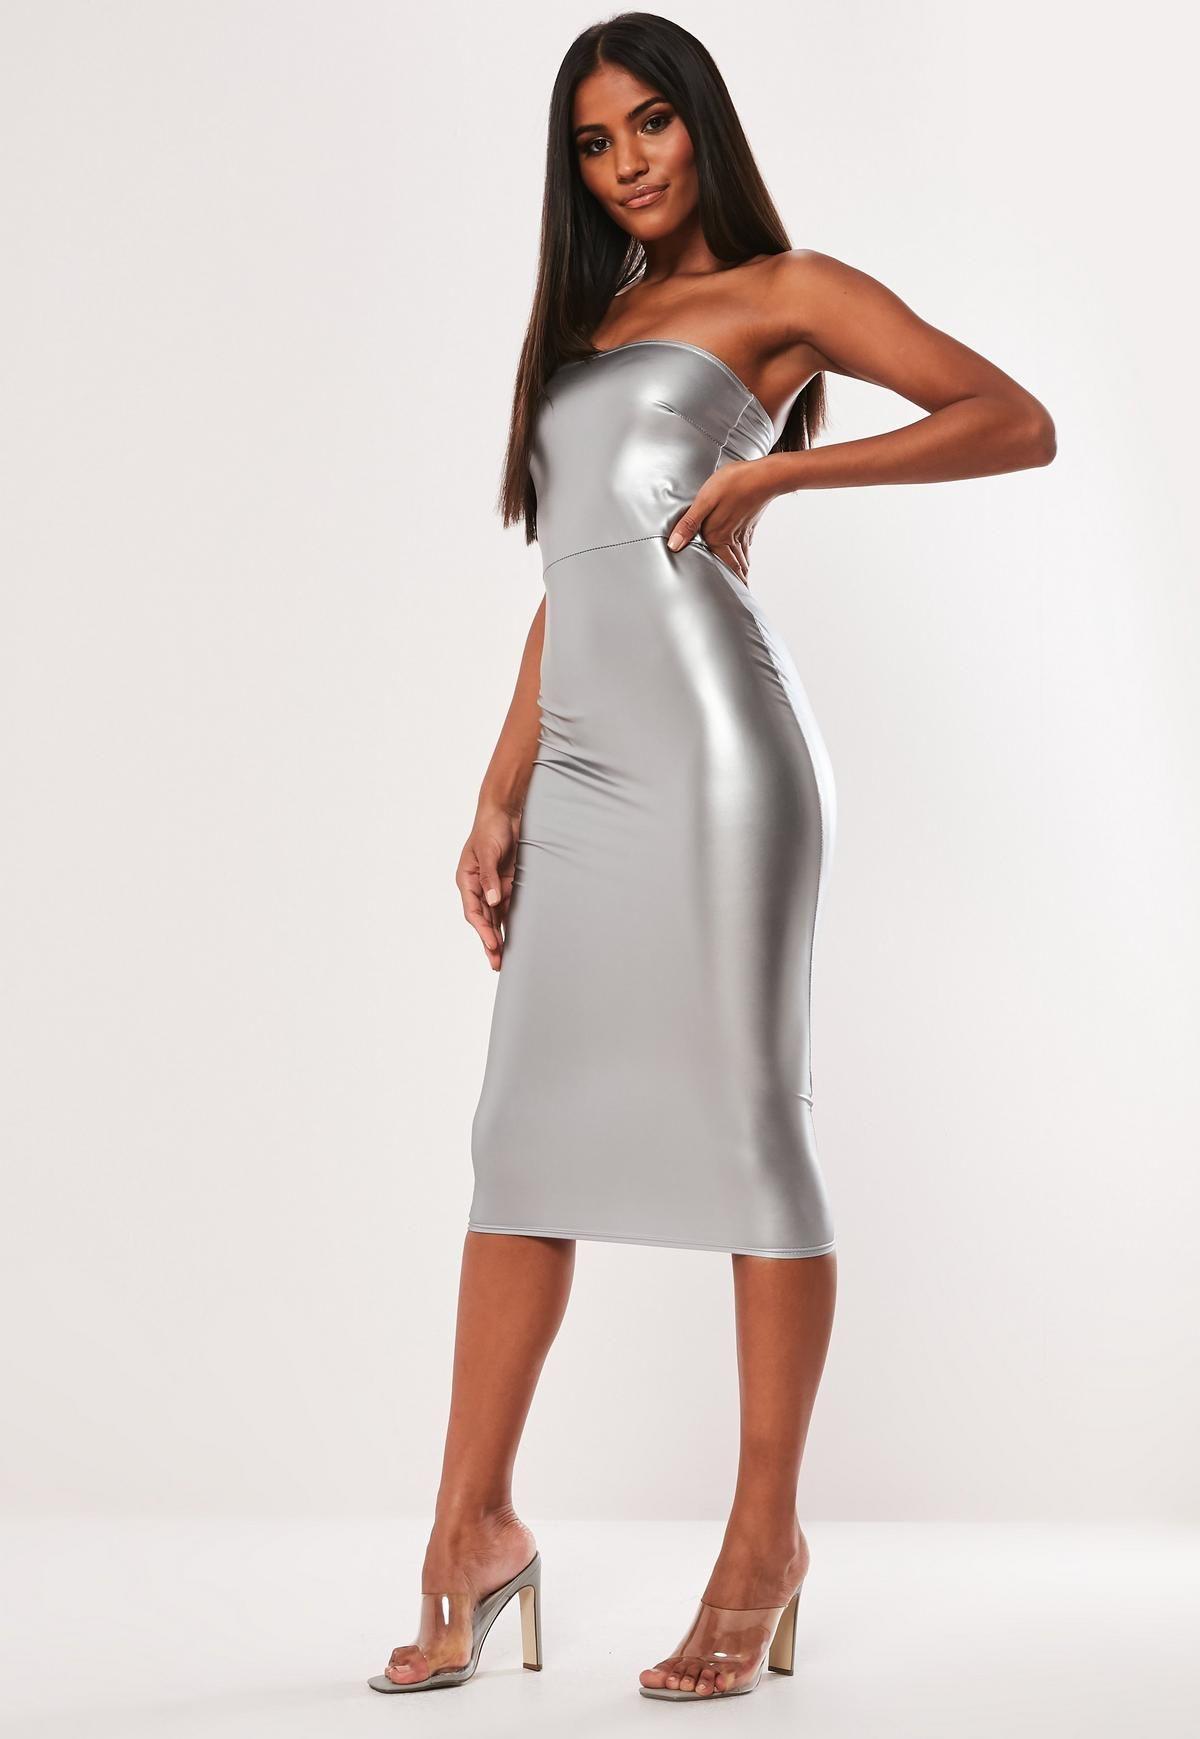 Silver Faux Leather Bandeau Bodycon Midi Dress Missguided Silver Dress Outfit Women Dress Online Midi Dress Bodycon [ 1739 x 1200 Pixel ]